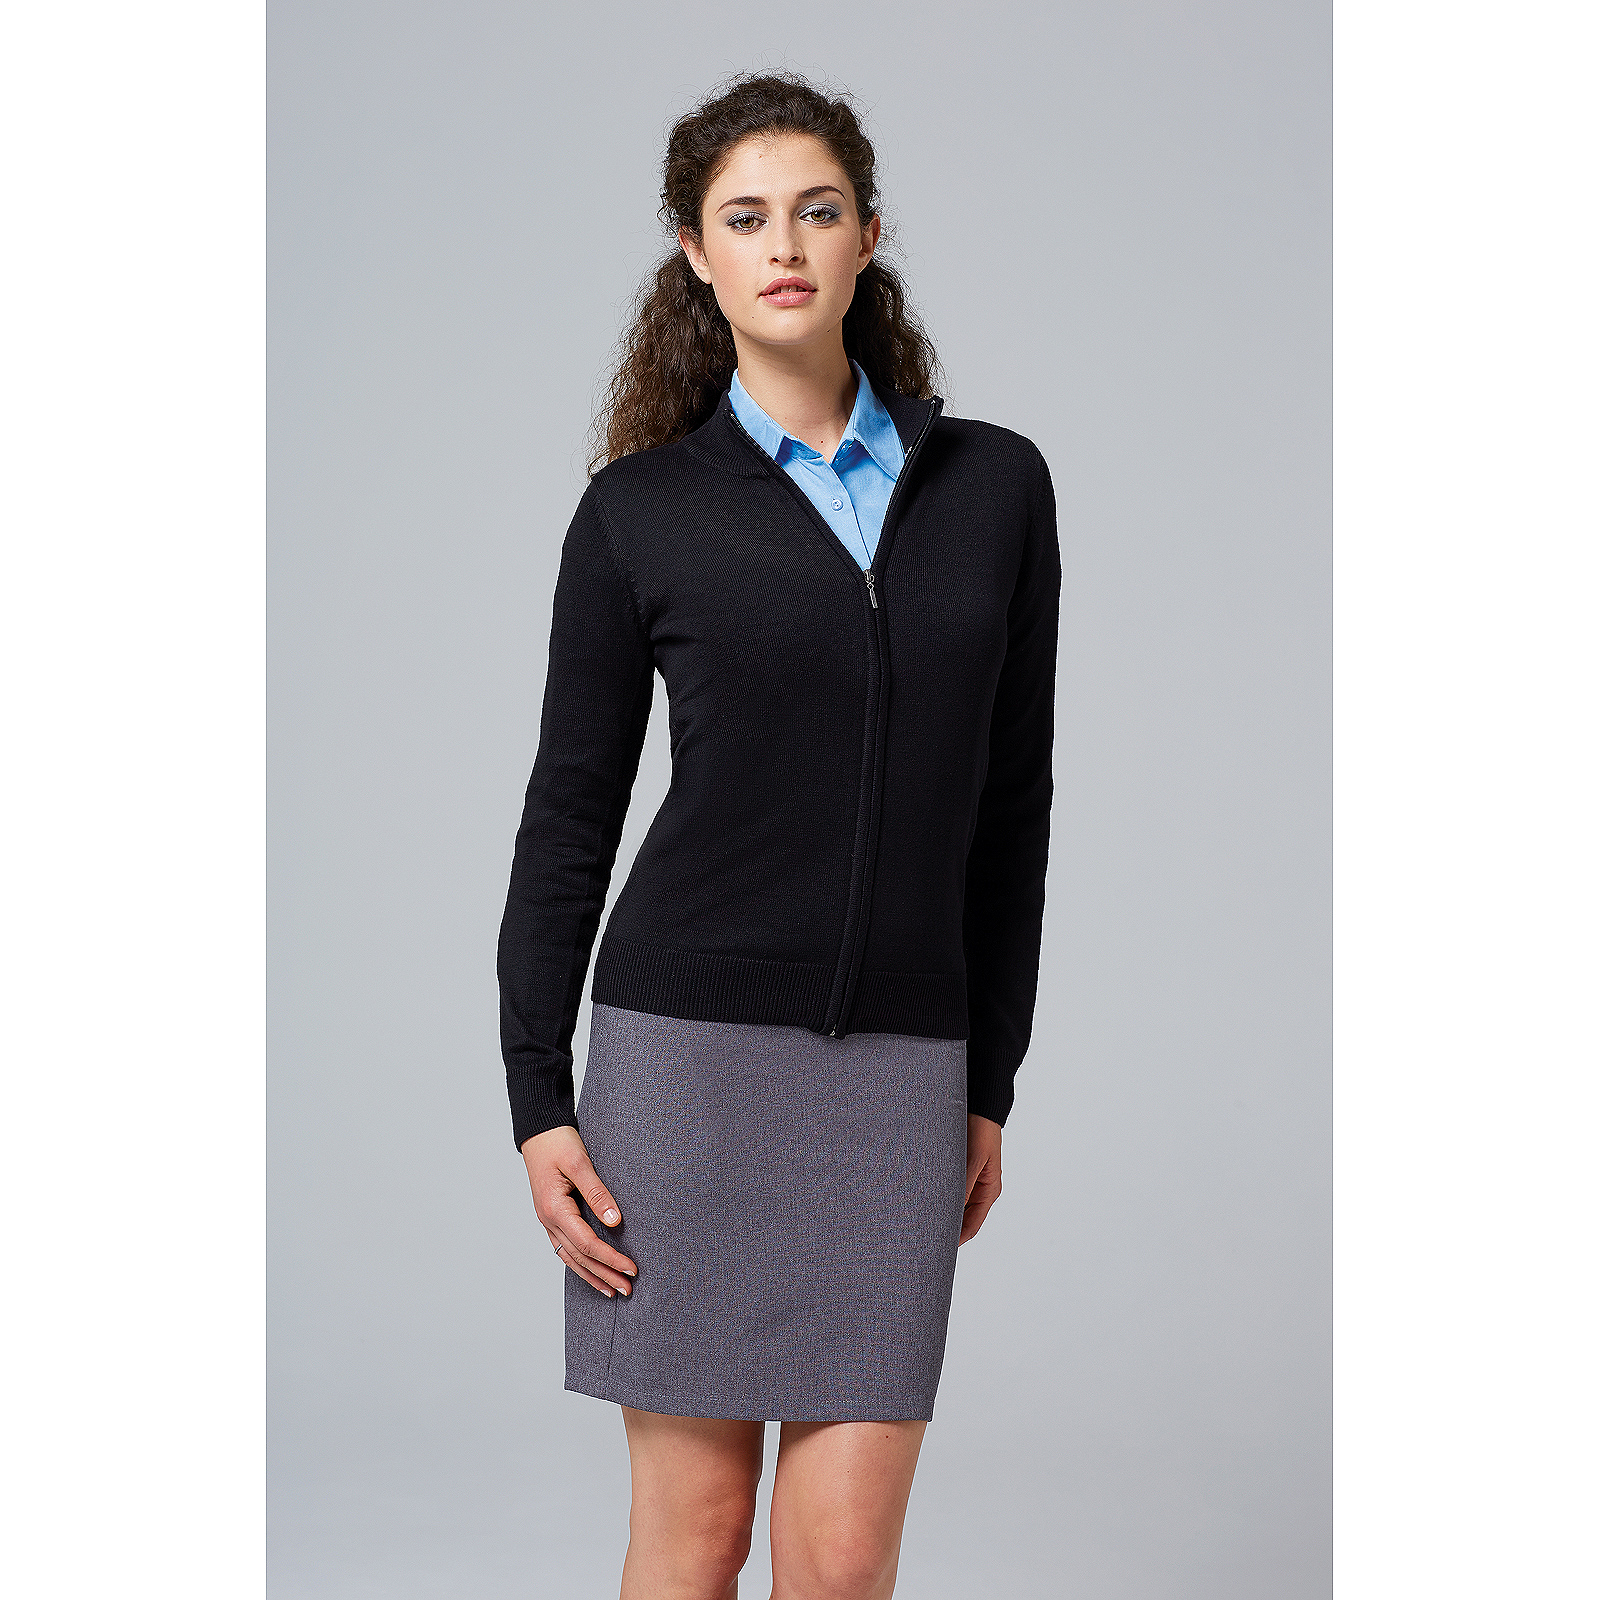 Ladies Gordon Full Zip Cardigan Cotton Acrylic Knitwear Warm Cosy Womens Sweater